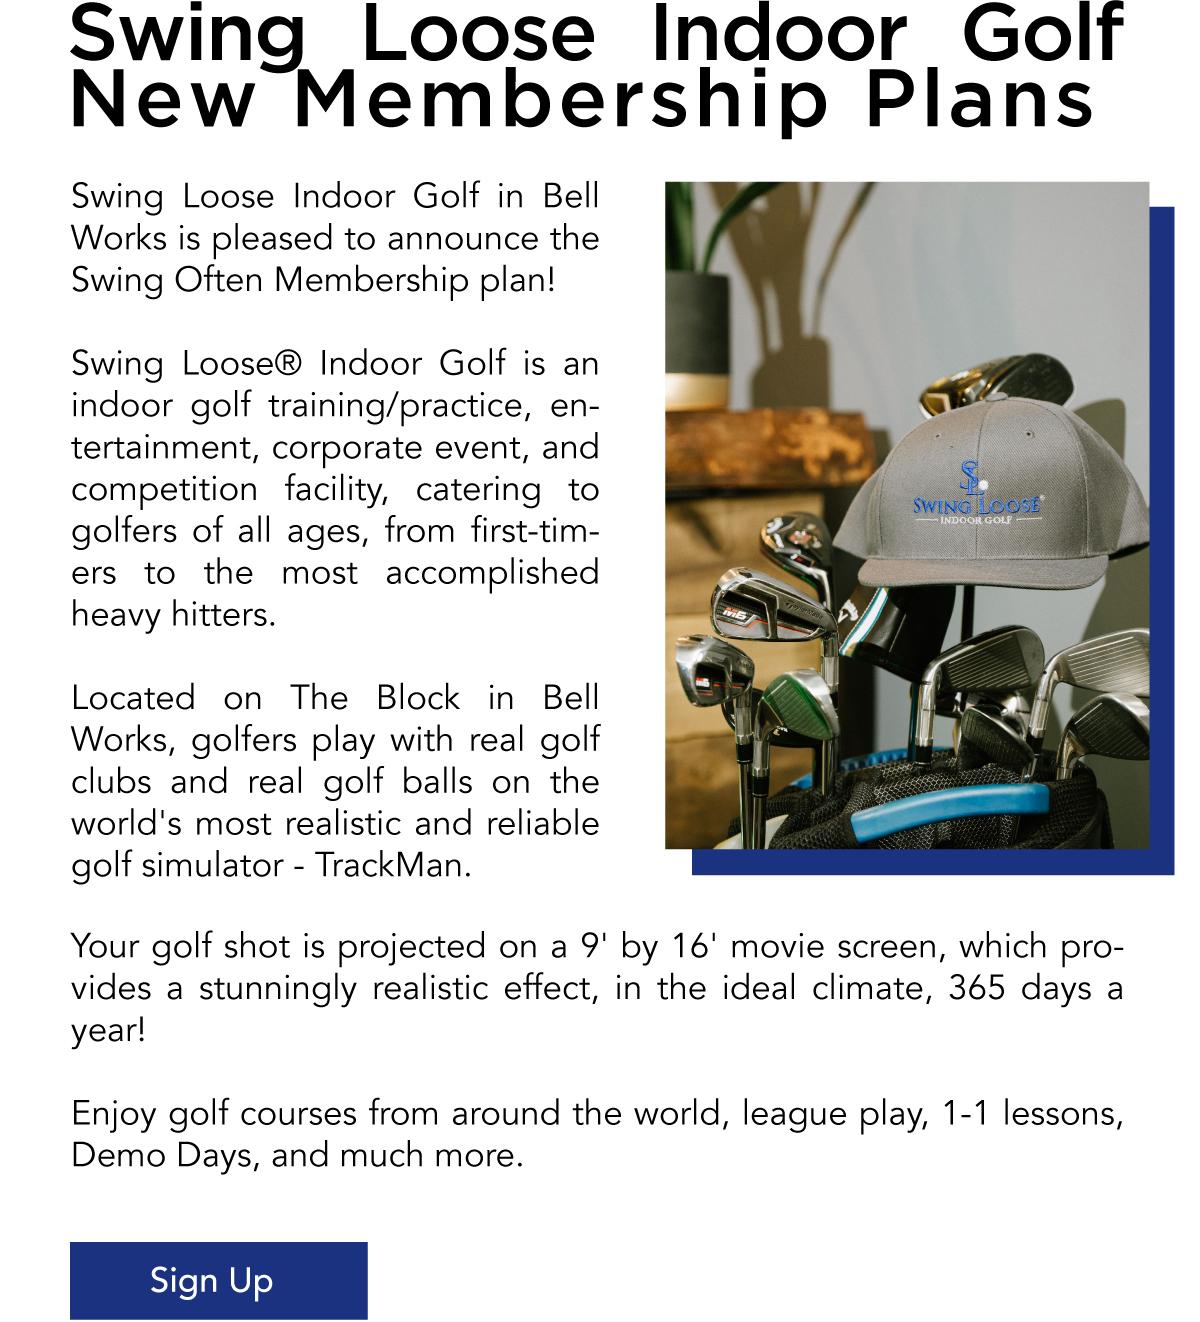 Swing Loose Indoor Gold New Membership Plans